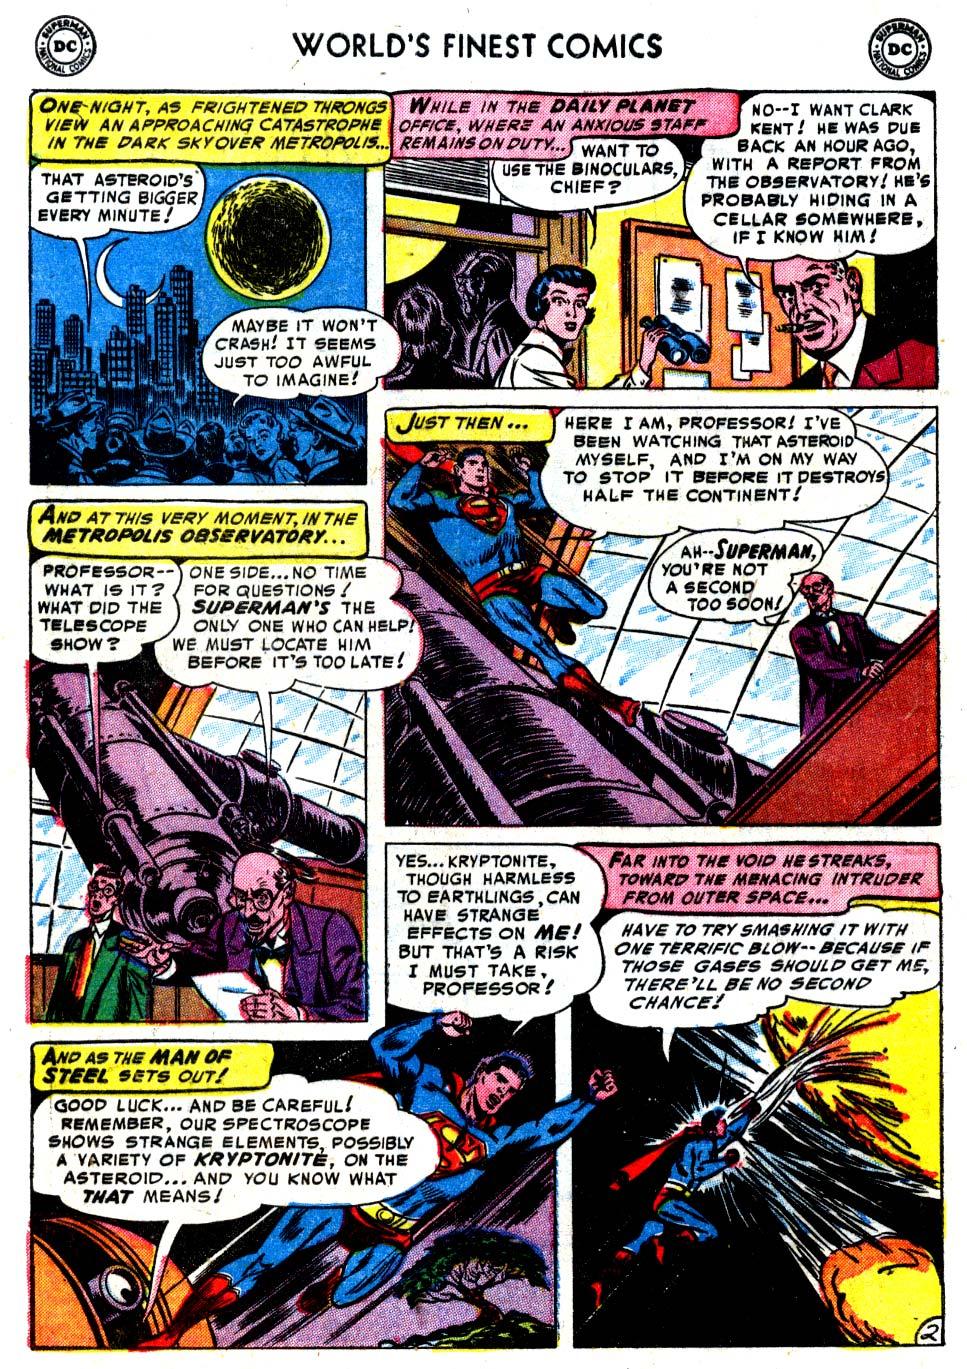 Read online World's Finest Comics comic -  Issue #68 - 4